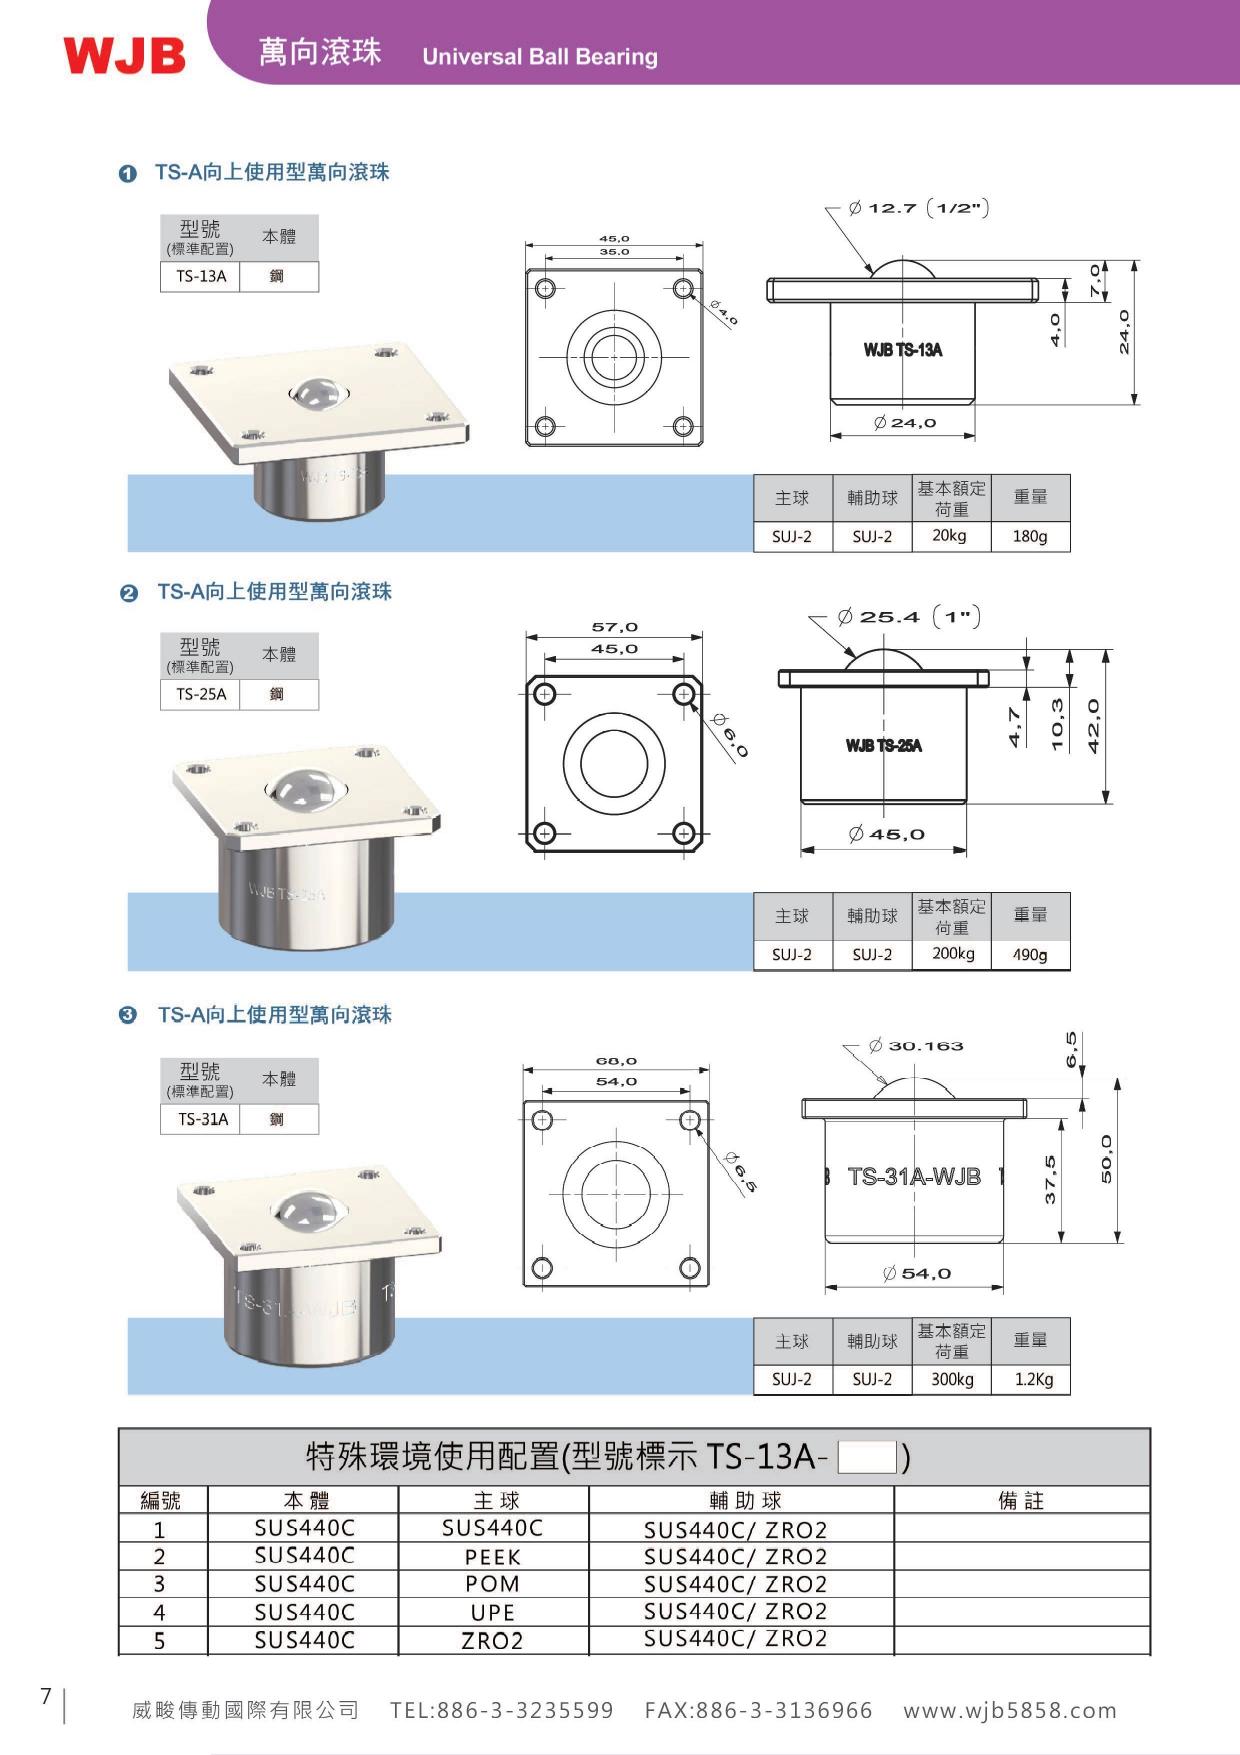 proimages/pro/universal_ball_bearing/TS-A/TS-A-01.jpg